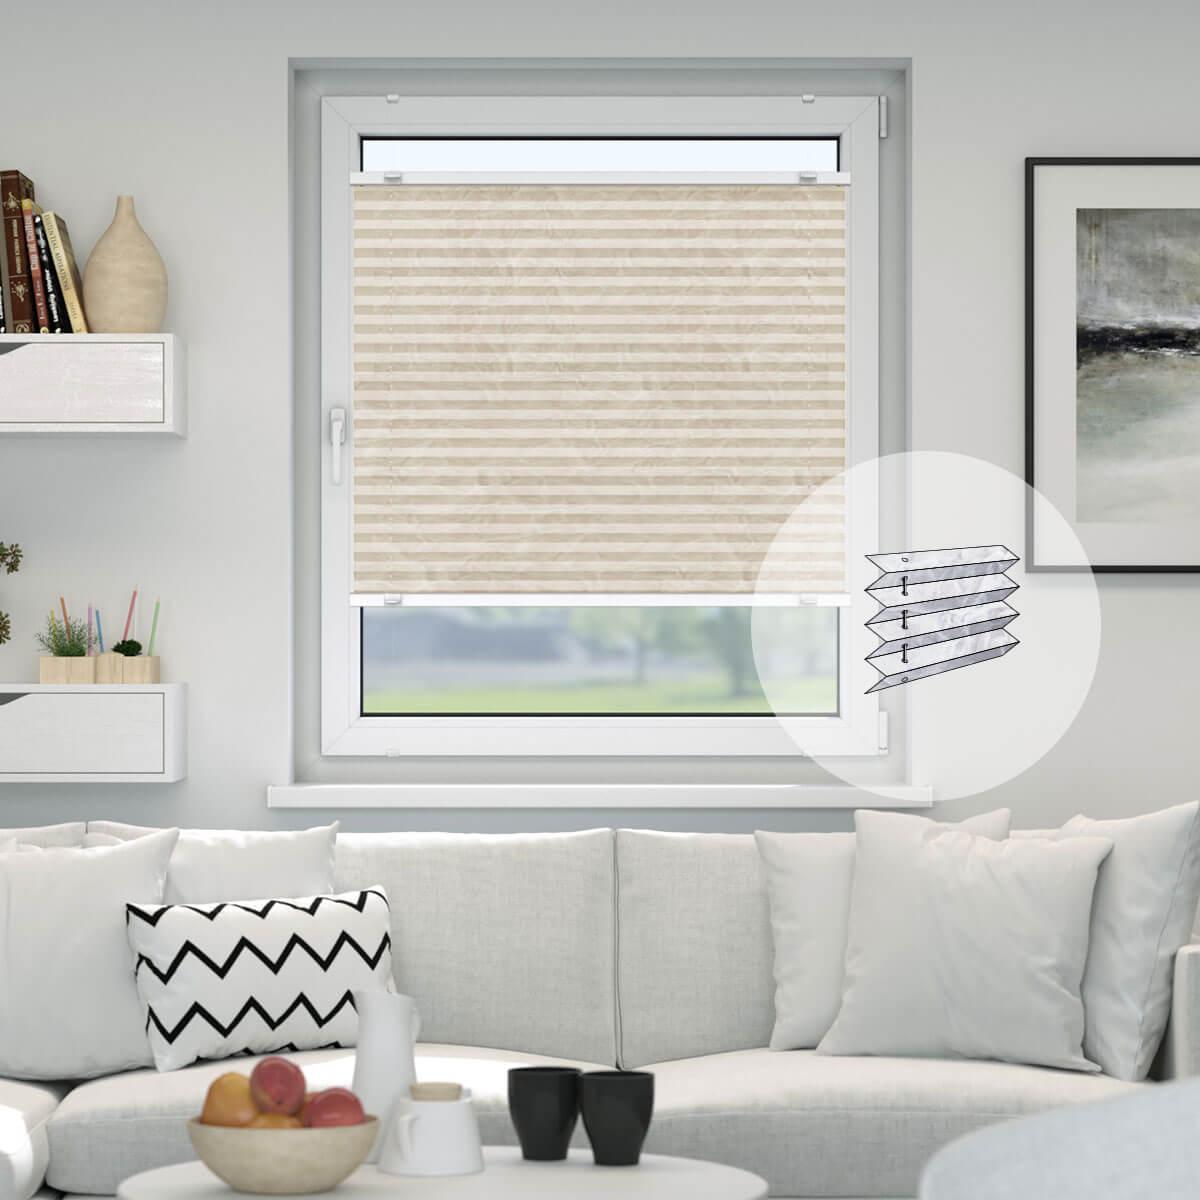 plissee 115 cm breit qp62 hitoiro. Black Bedroom Furniture Sets. Home Design Ideas